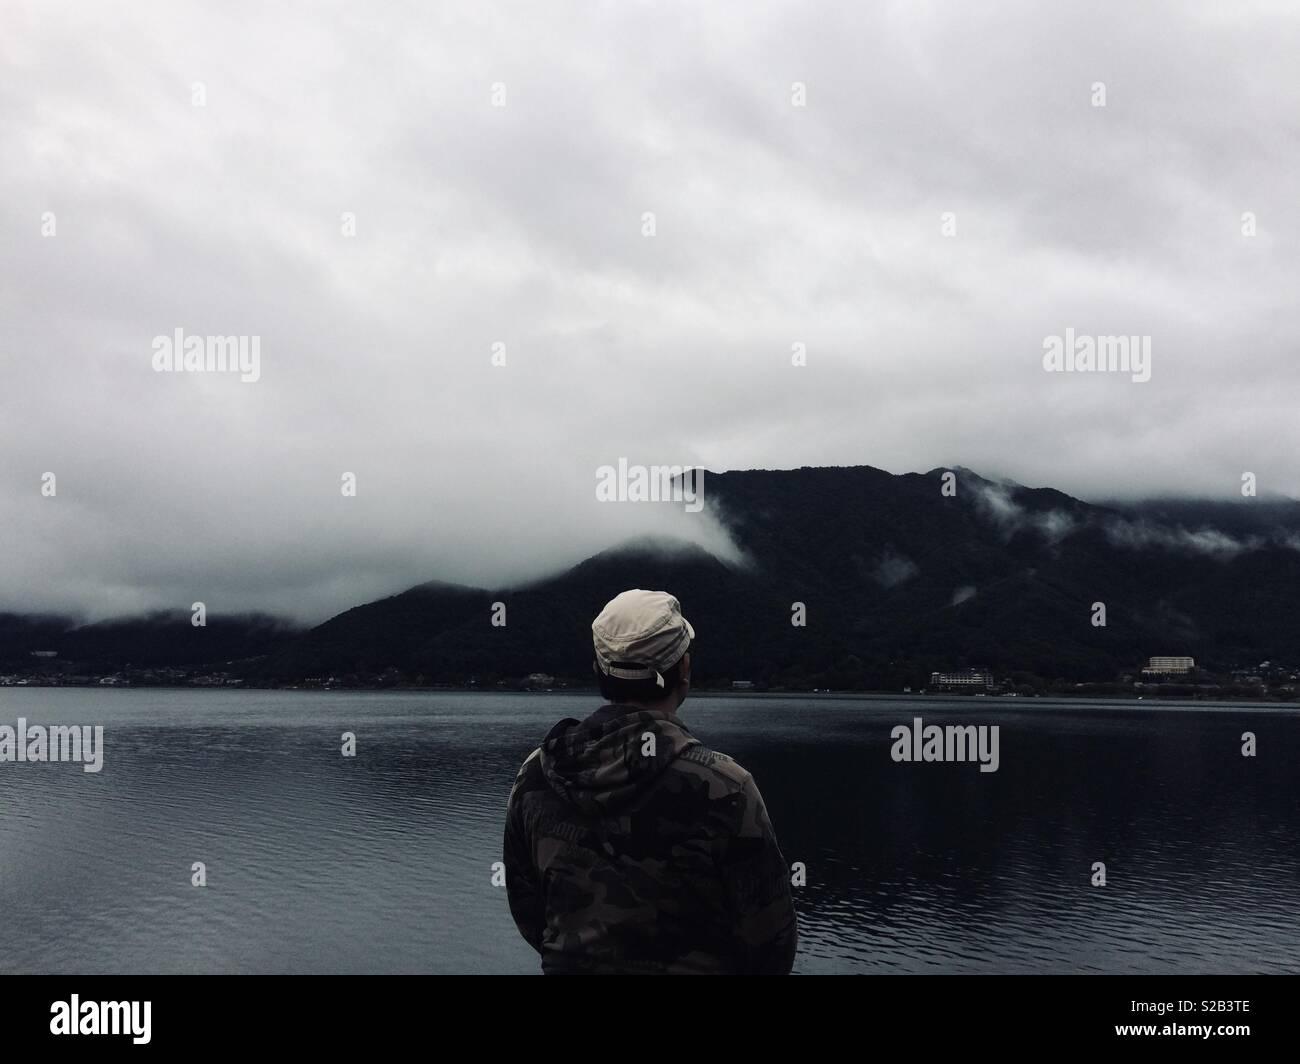 Mirando el Lago Kawaguchi Imagen De Stock